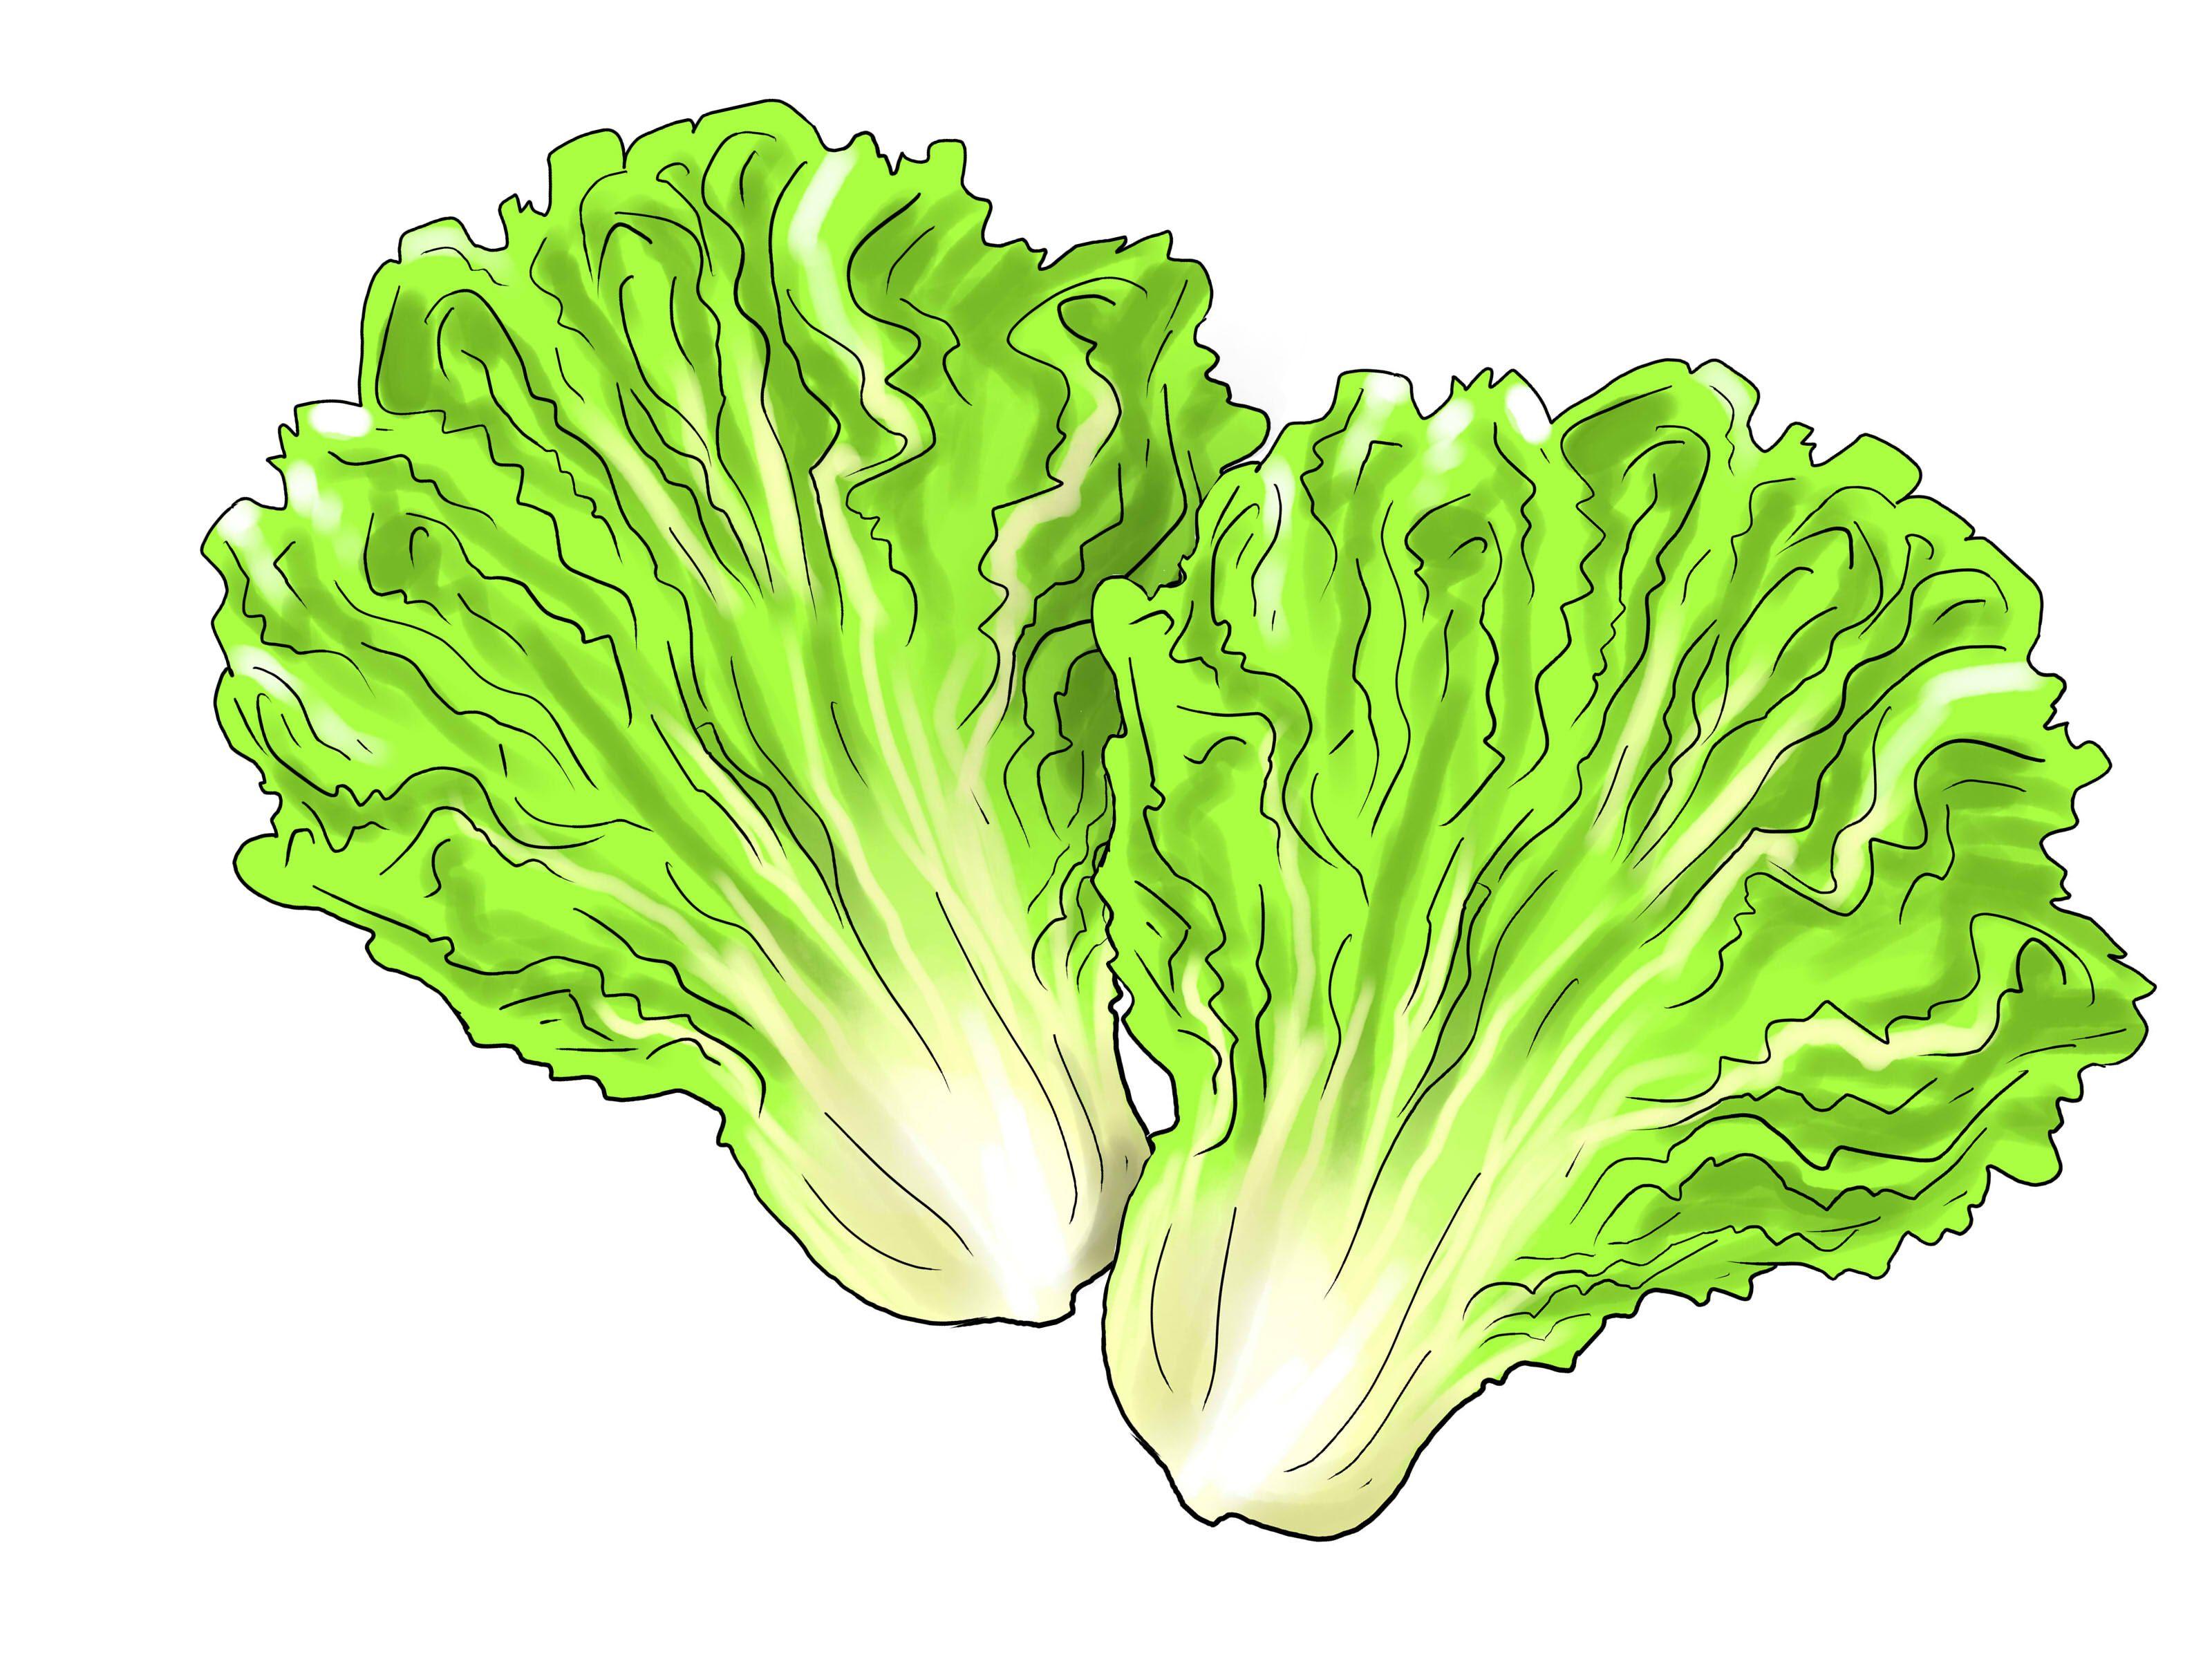 Lettuce leaf clipart 2 » Clipart Portal.